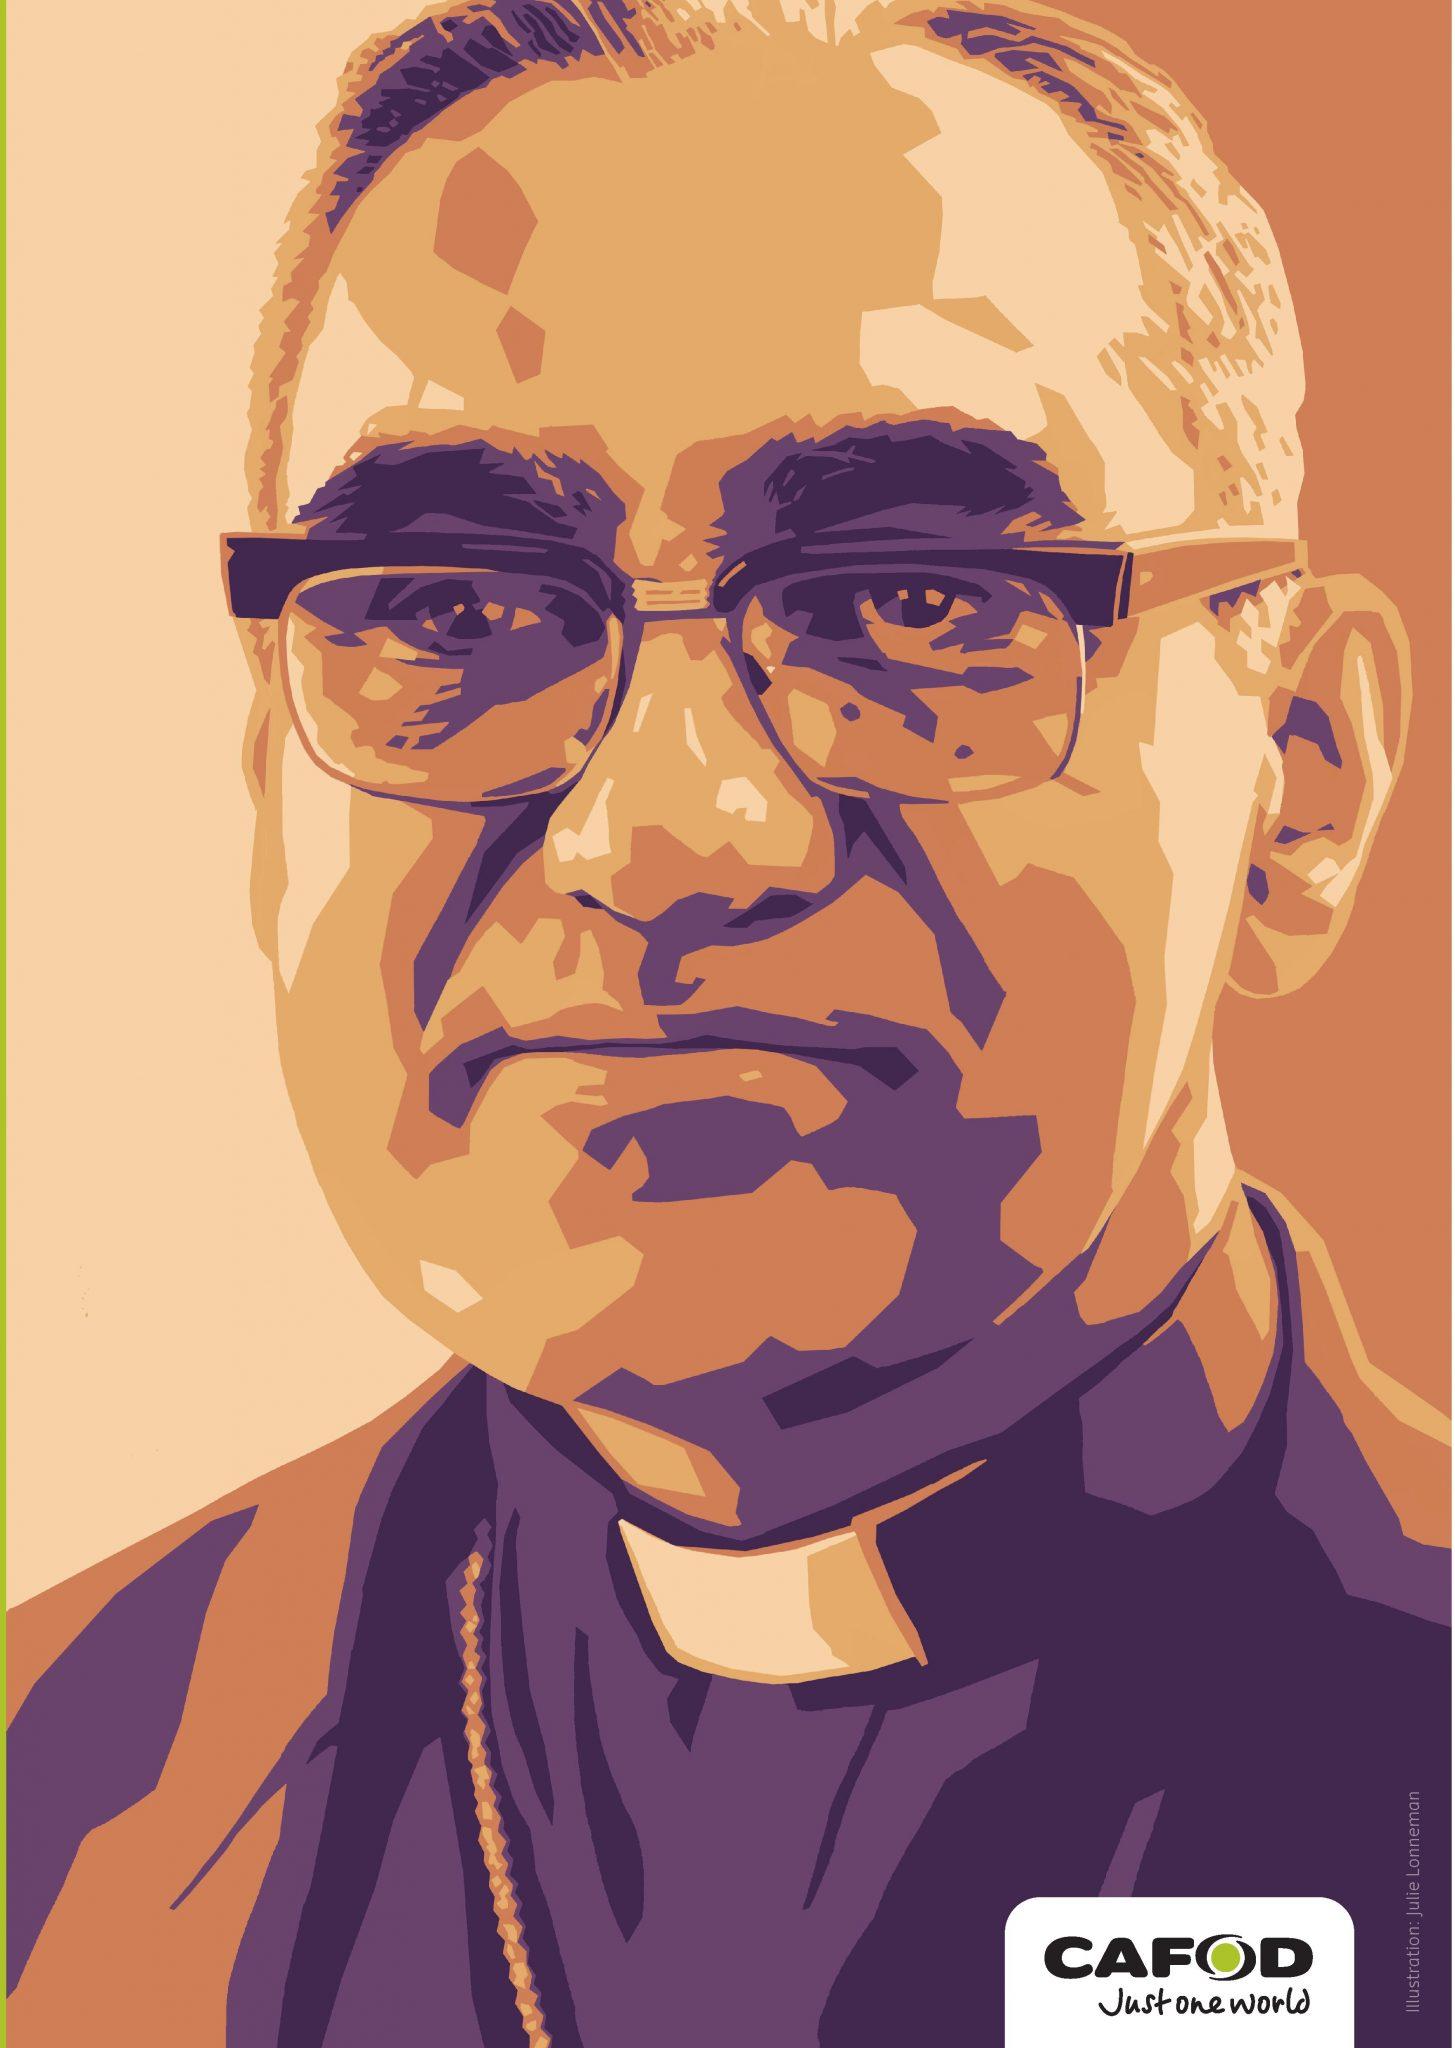 Southark, UK: Mass to Celebrate 101st Birthday of Bl. Oscar Romero